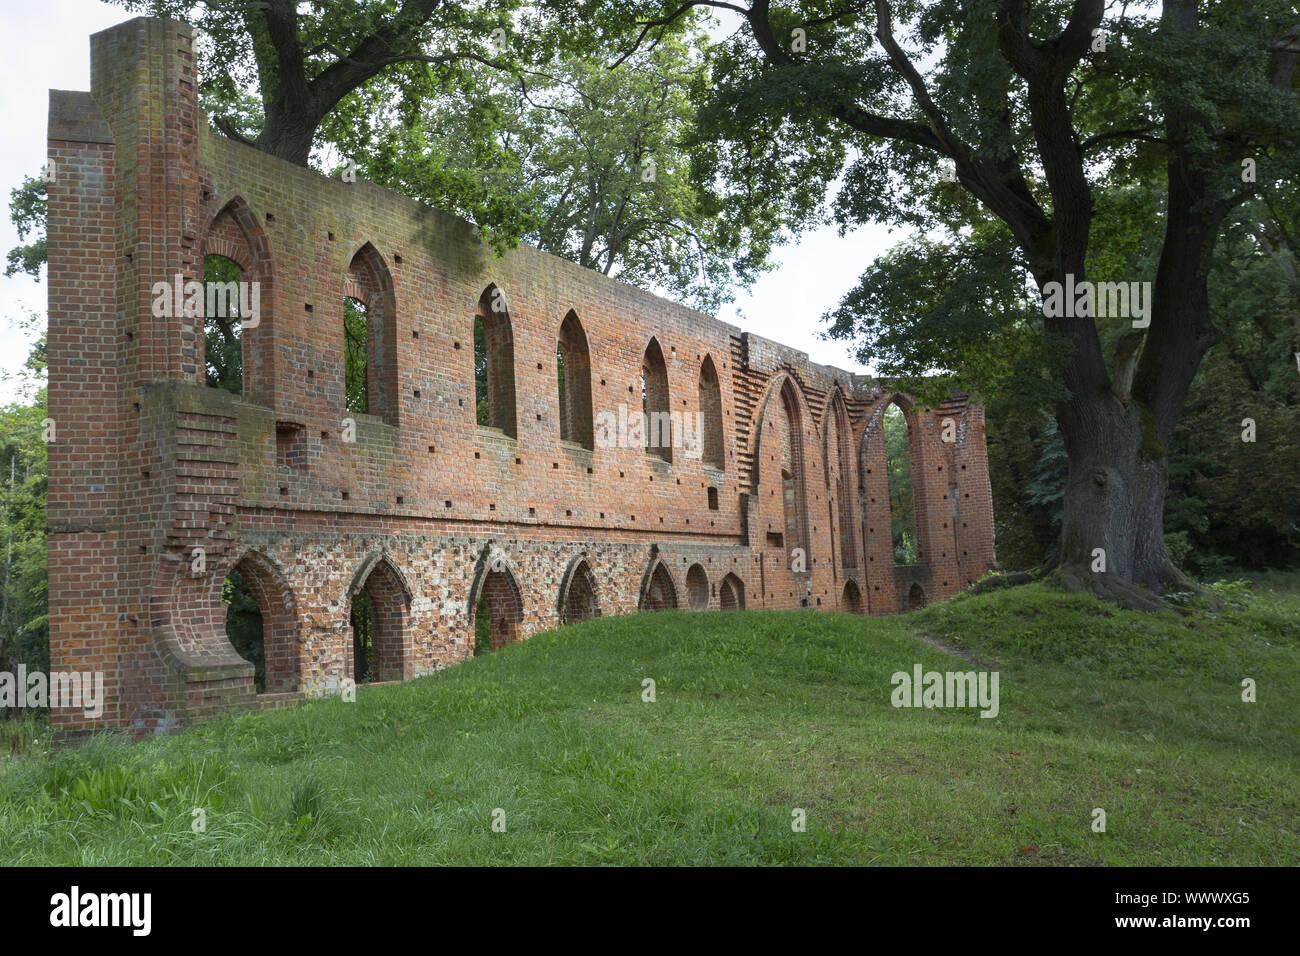 The monastery ruin in Boitzenburg, Uckermark Stock Photo